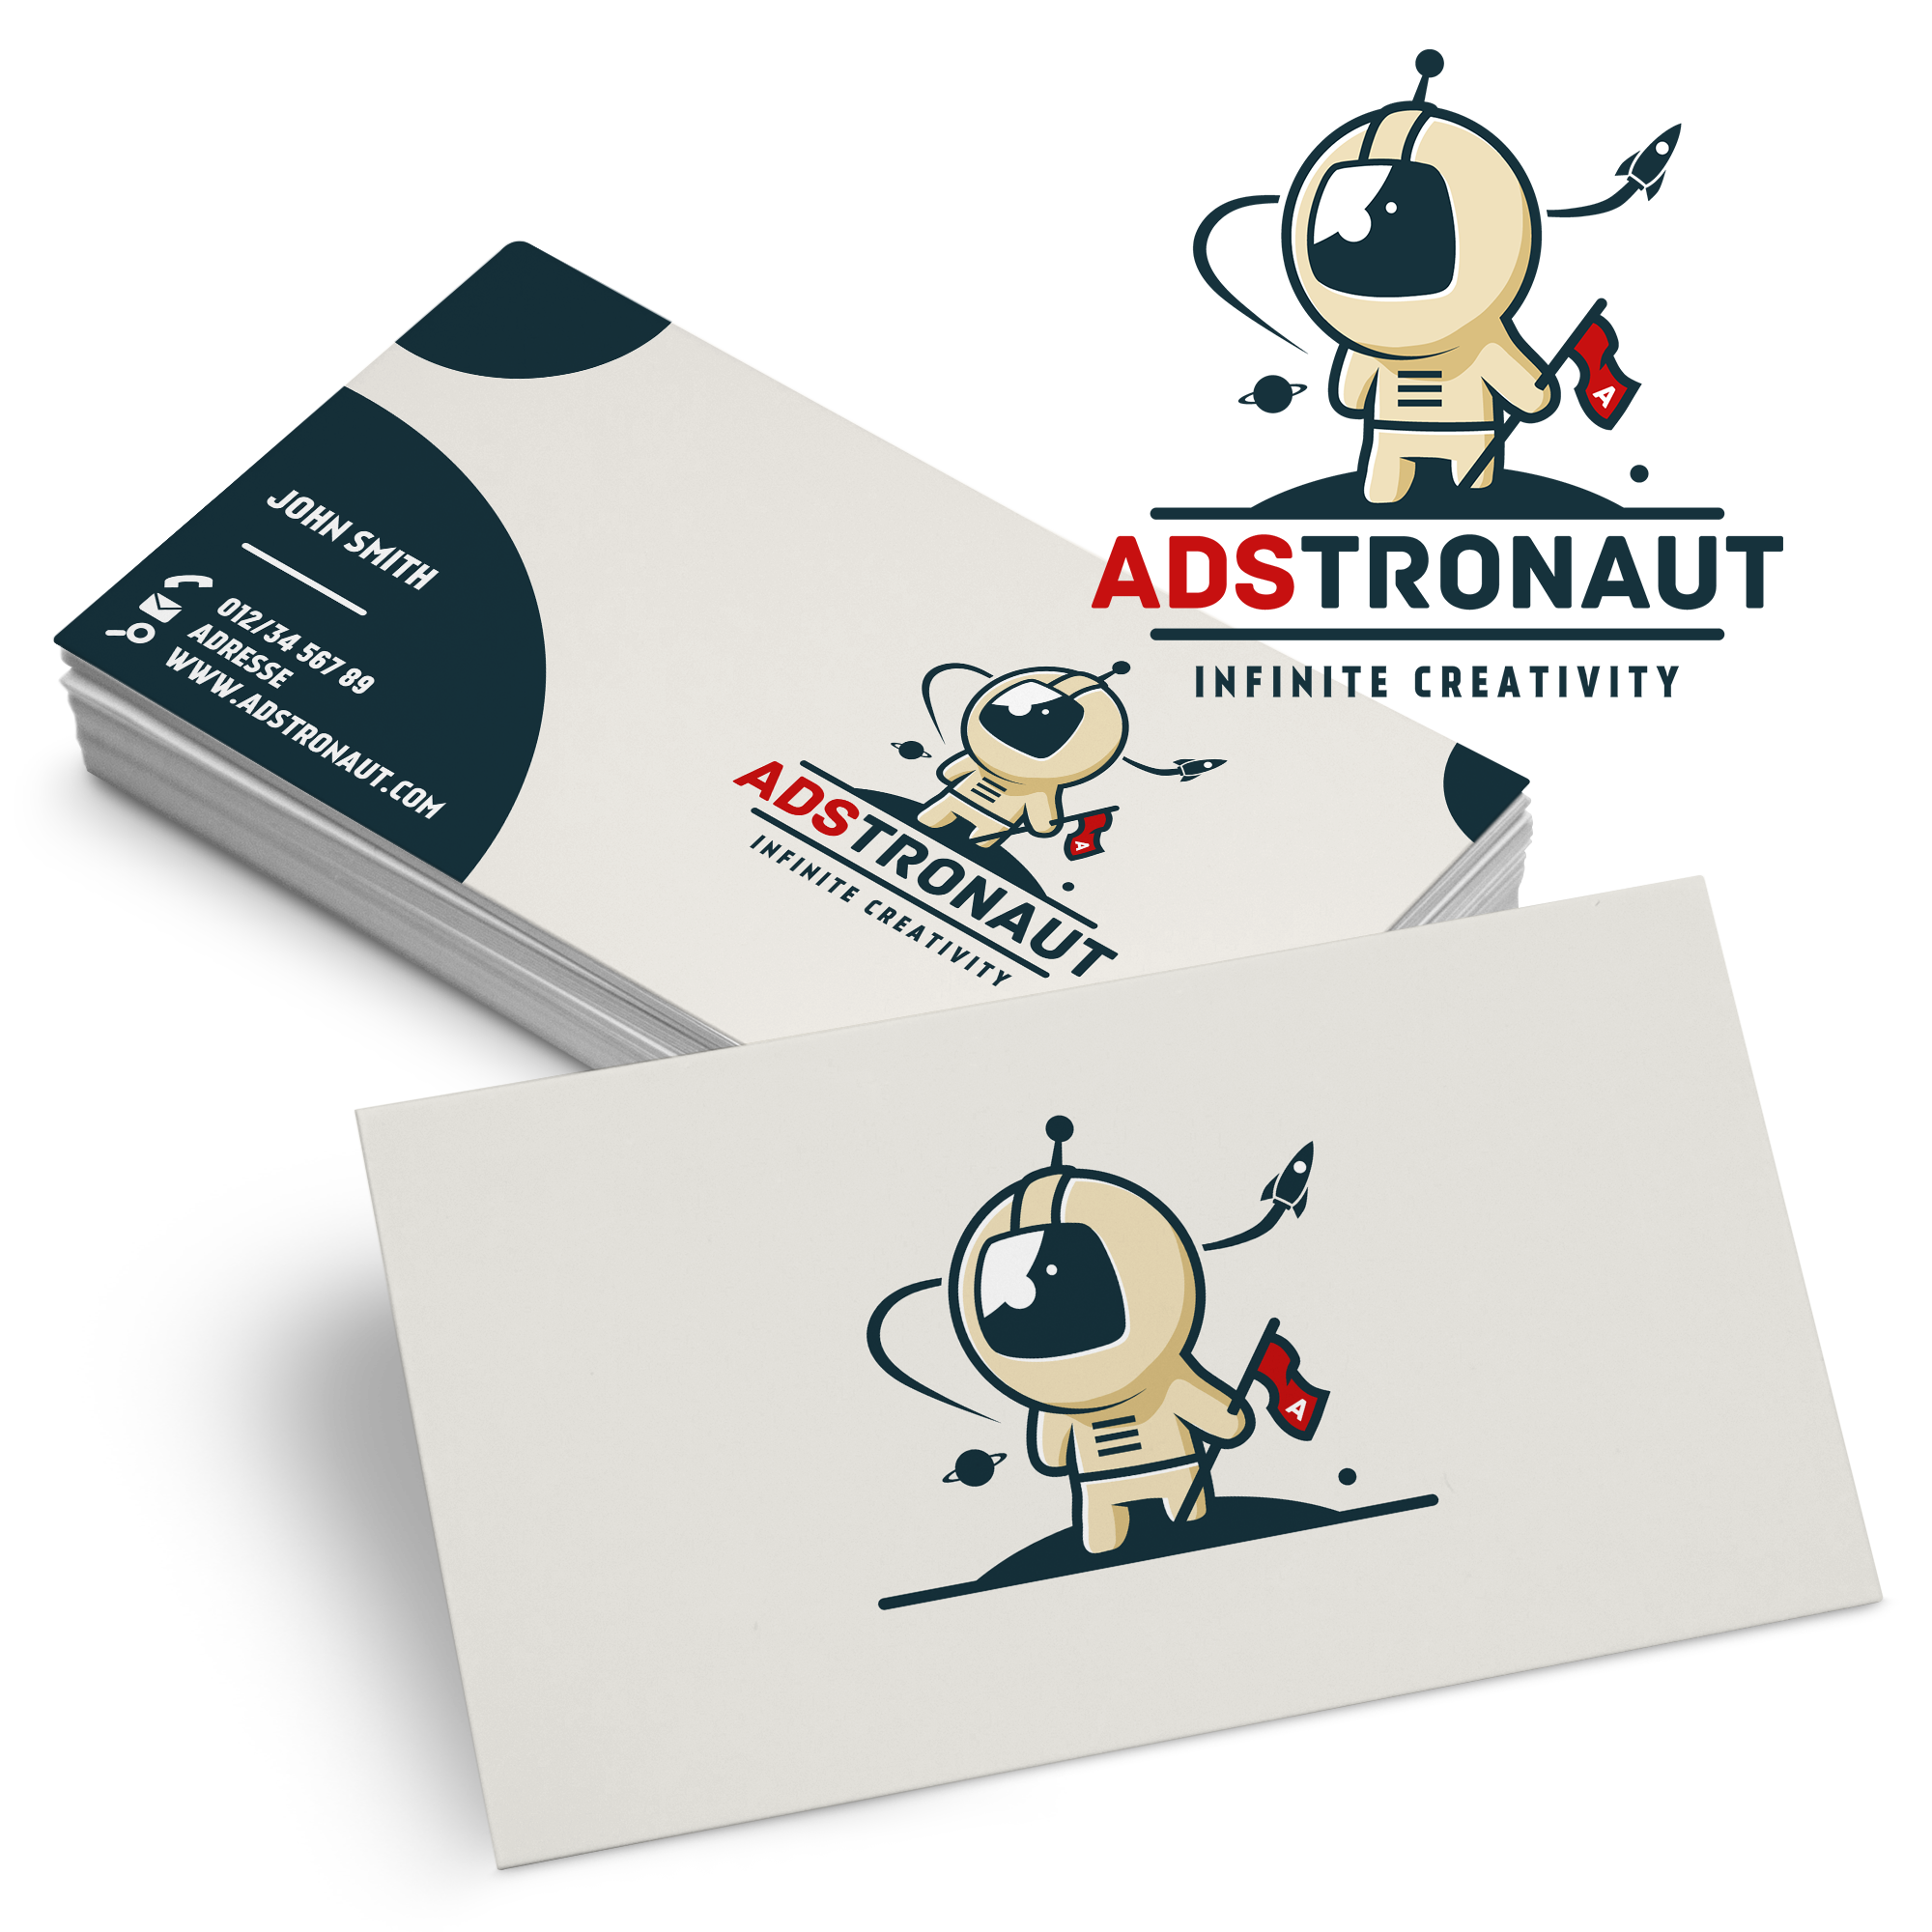 logo business cards - Ideal.vistalist.co